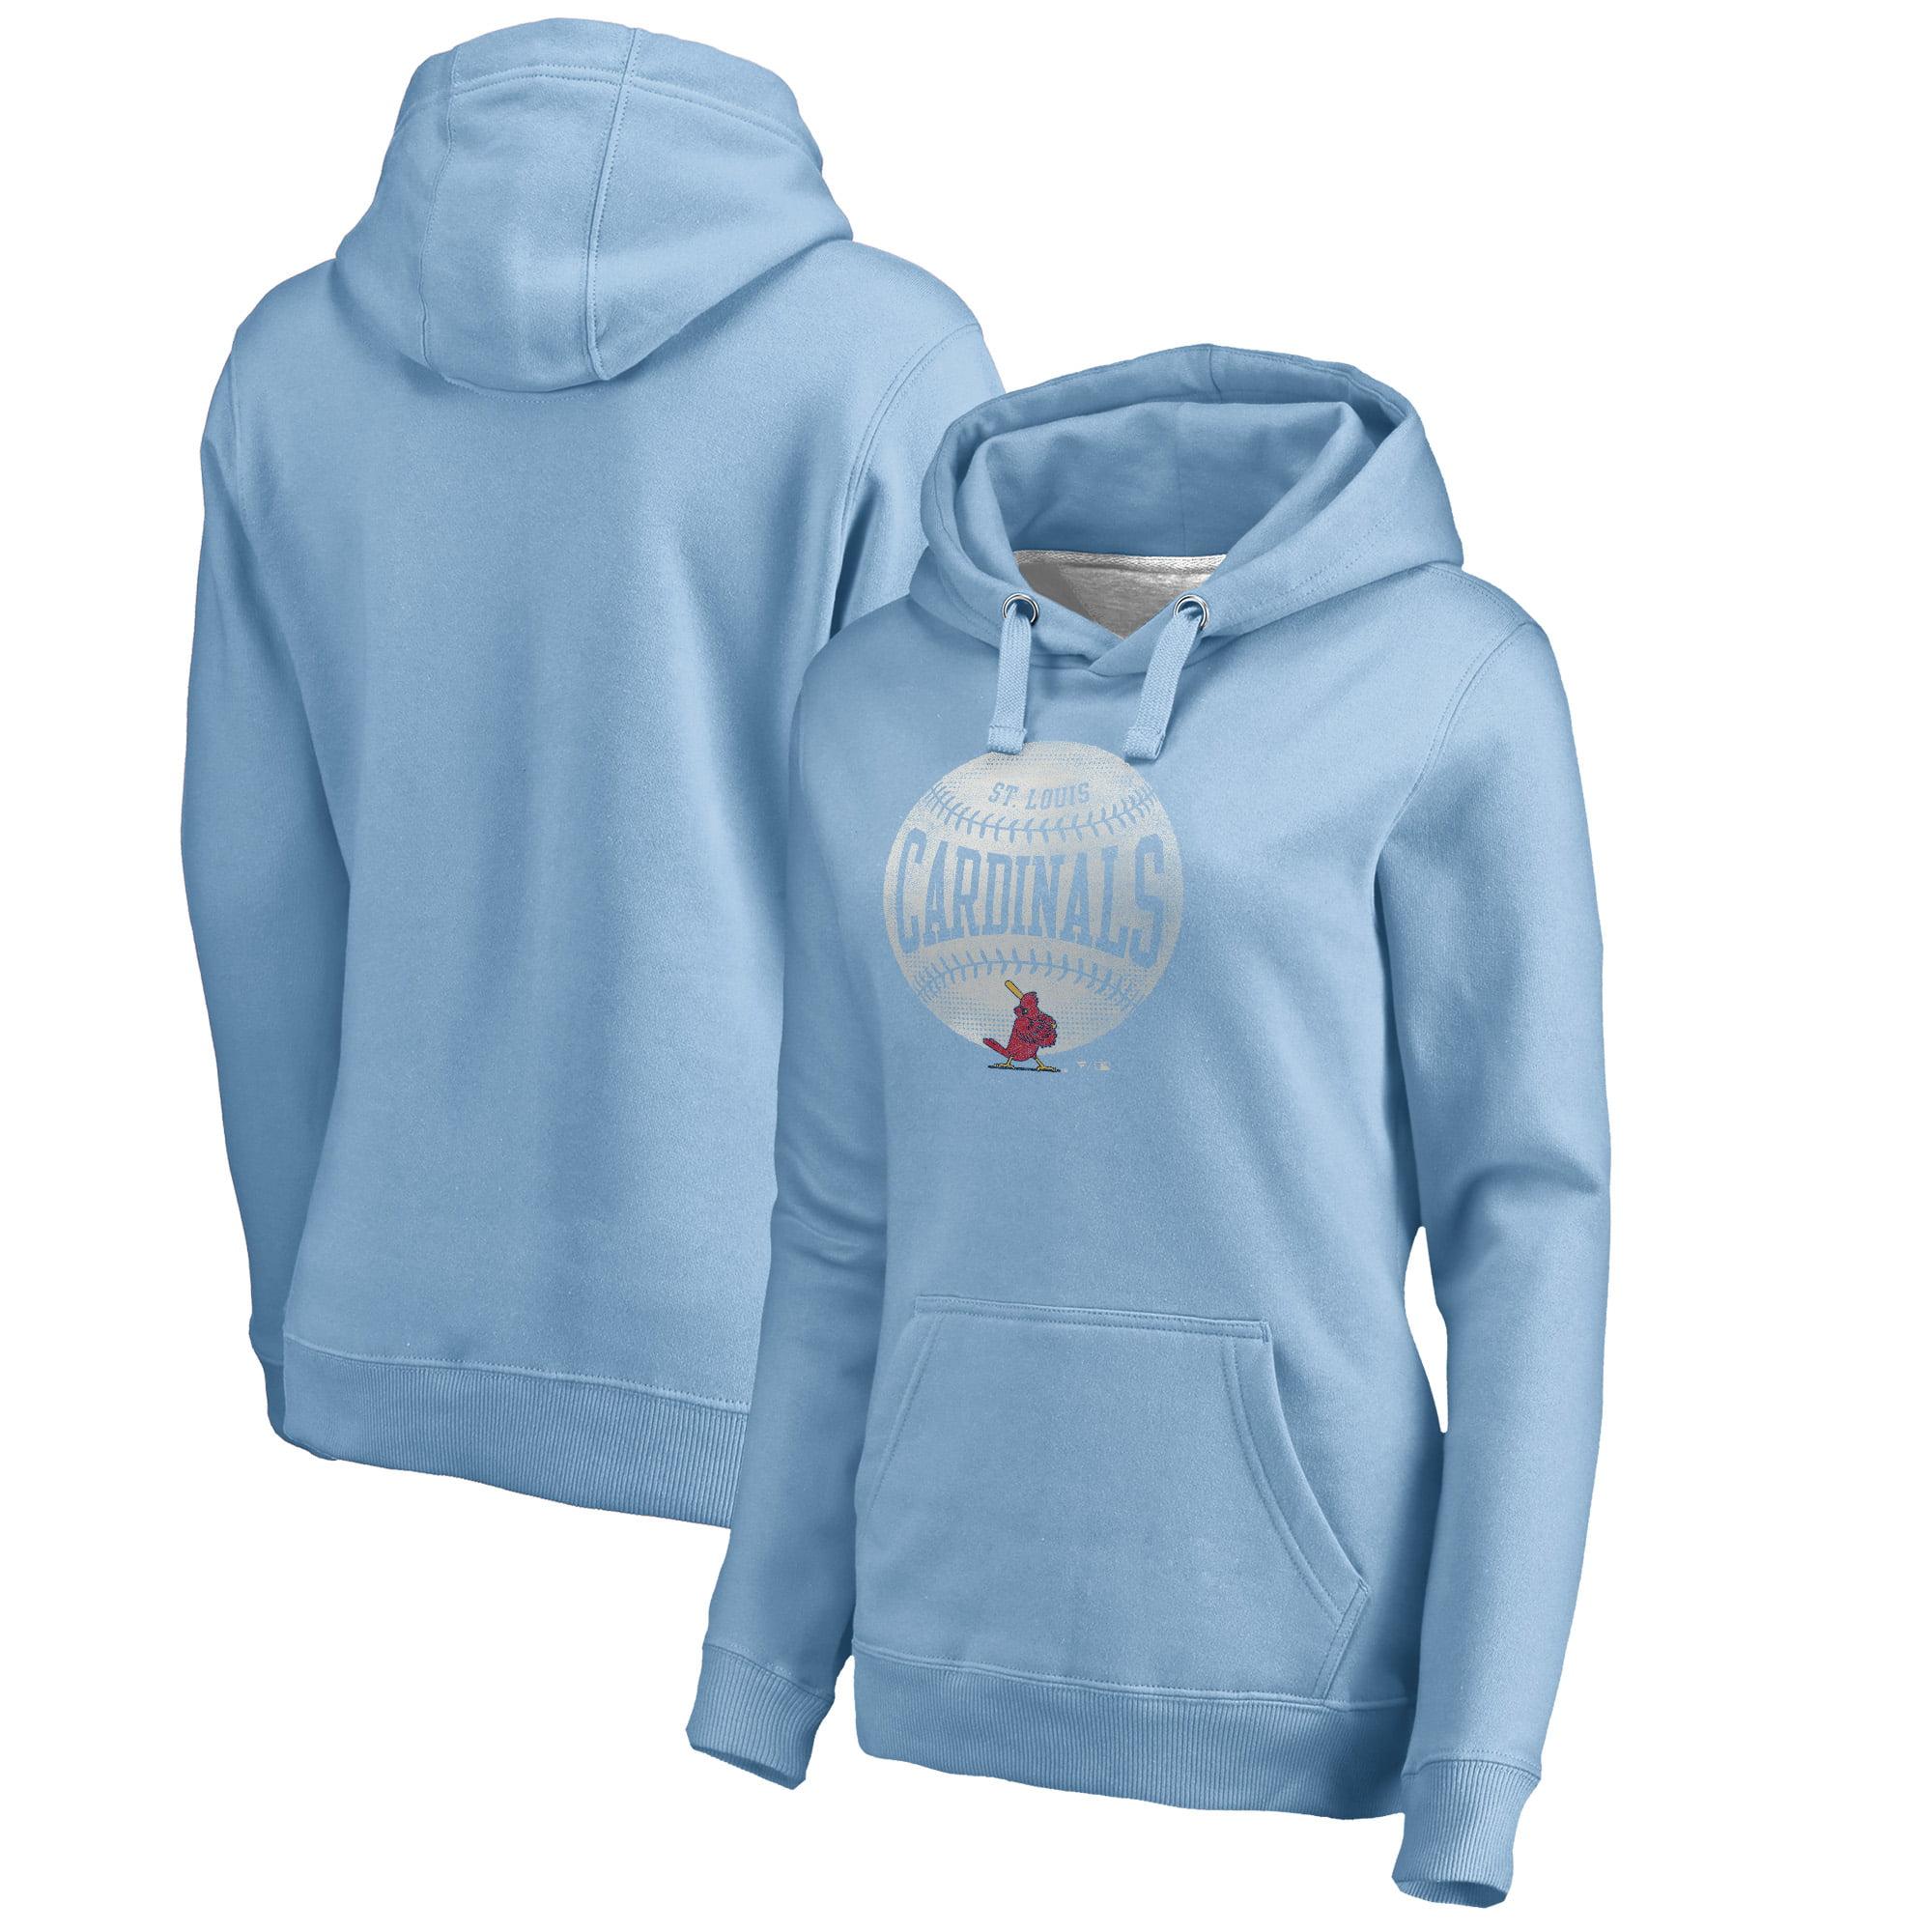 St. Louis Cardinals Fanatics Branded Women's Cooperstown Collection Slider Pullover Hoodie - Light Blue